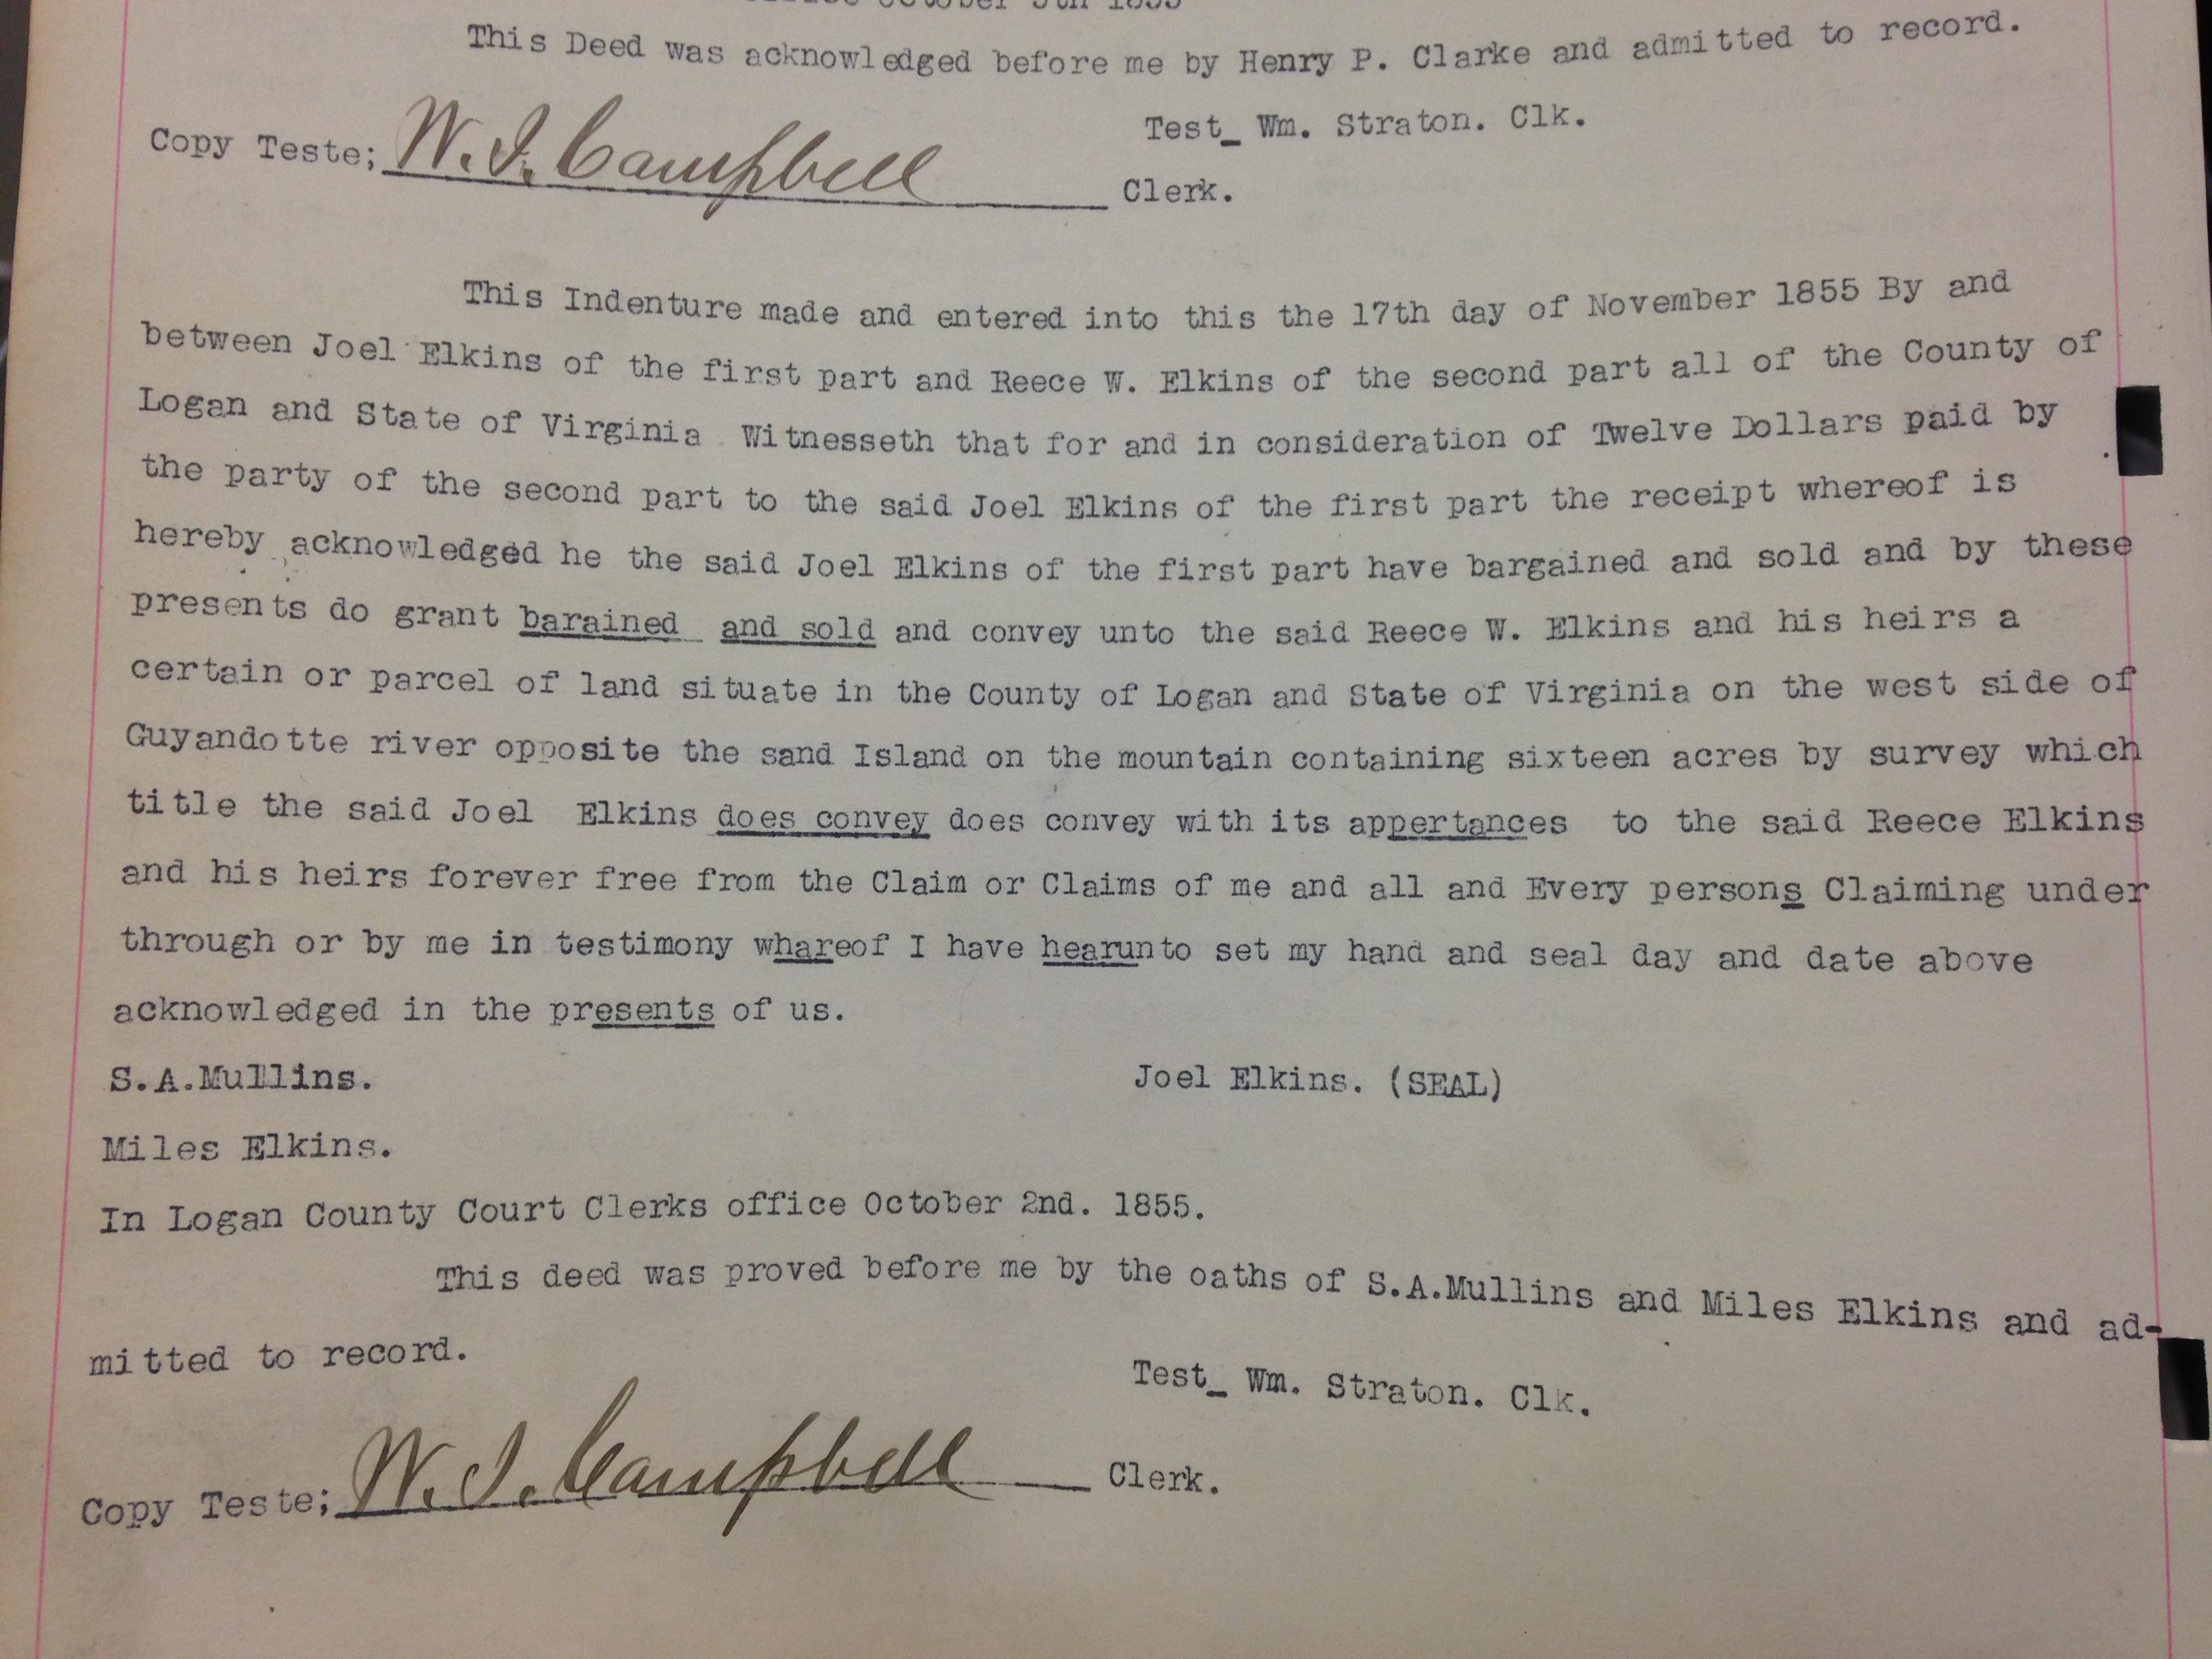 Joel Elkins to Reece W. Elkins Deed 1.JPG